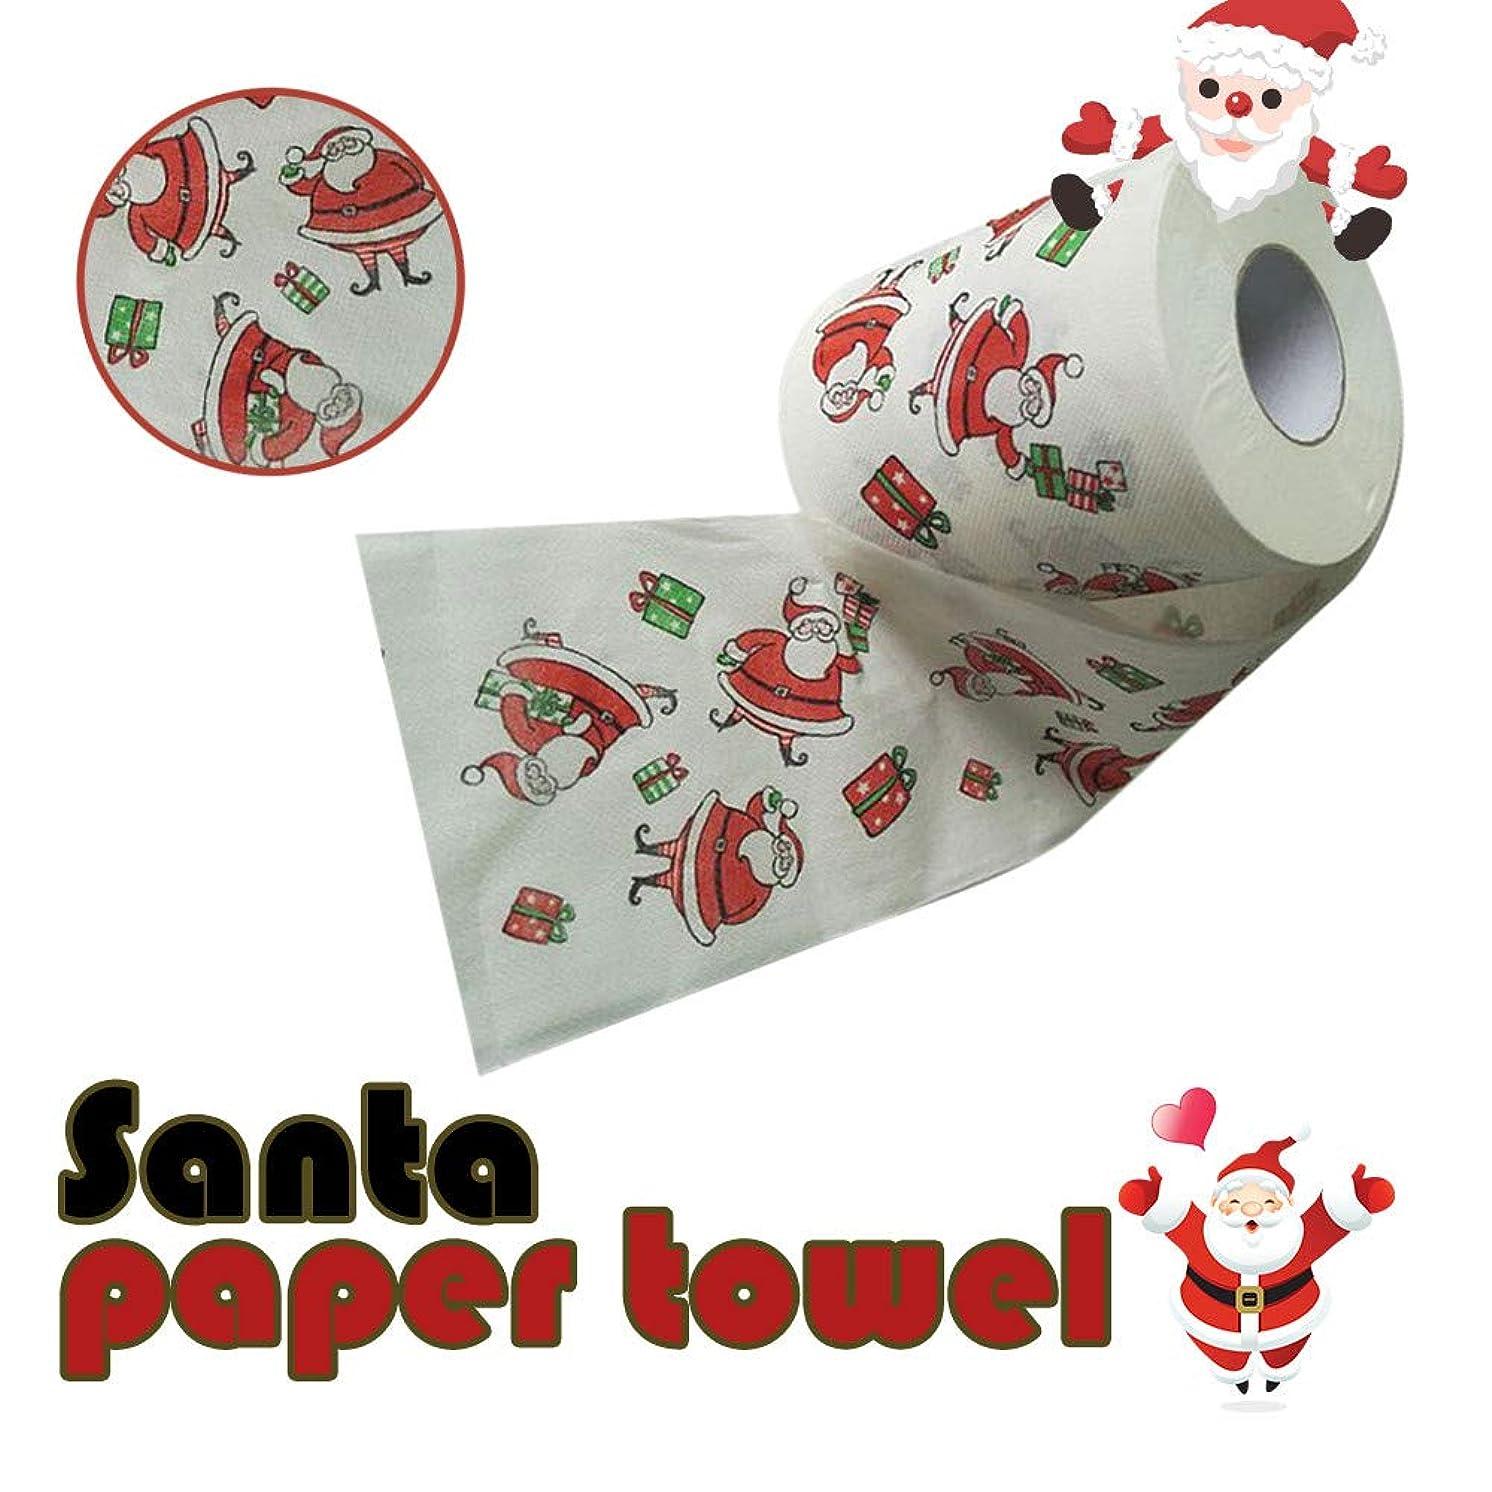 DZT1968 Christmas Snowman Santa Claus Pattern Roll Paper Print Interesting Toilet Paper Table Kitchen Paper (A)